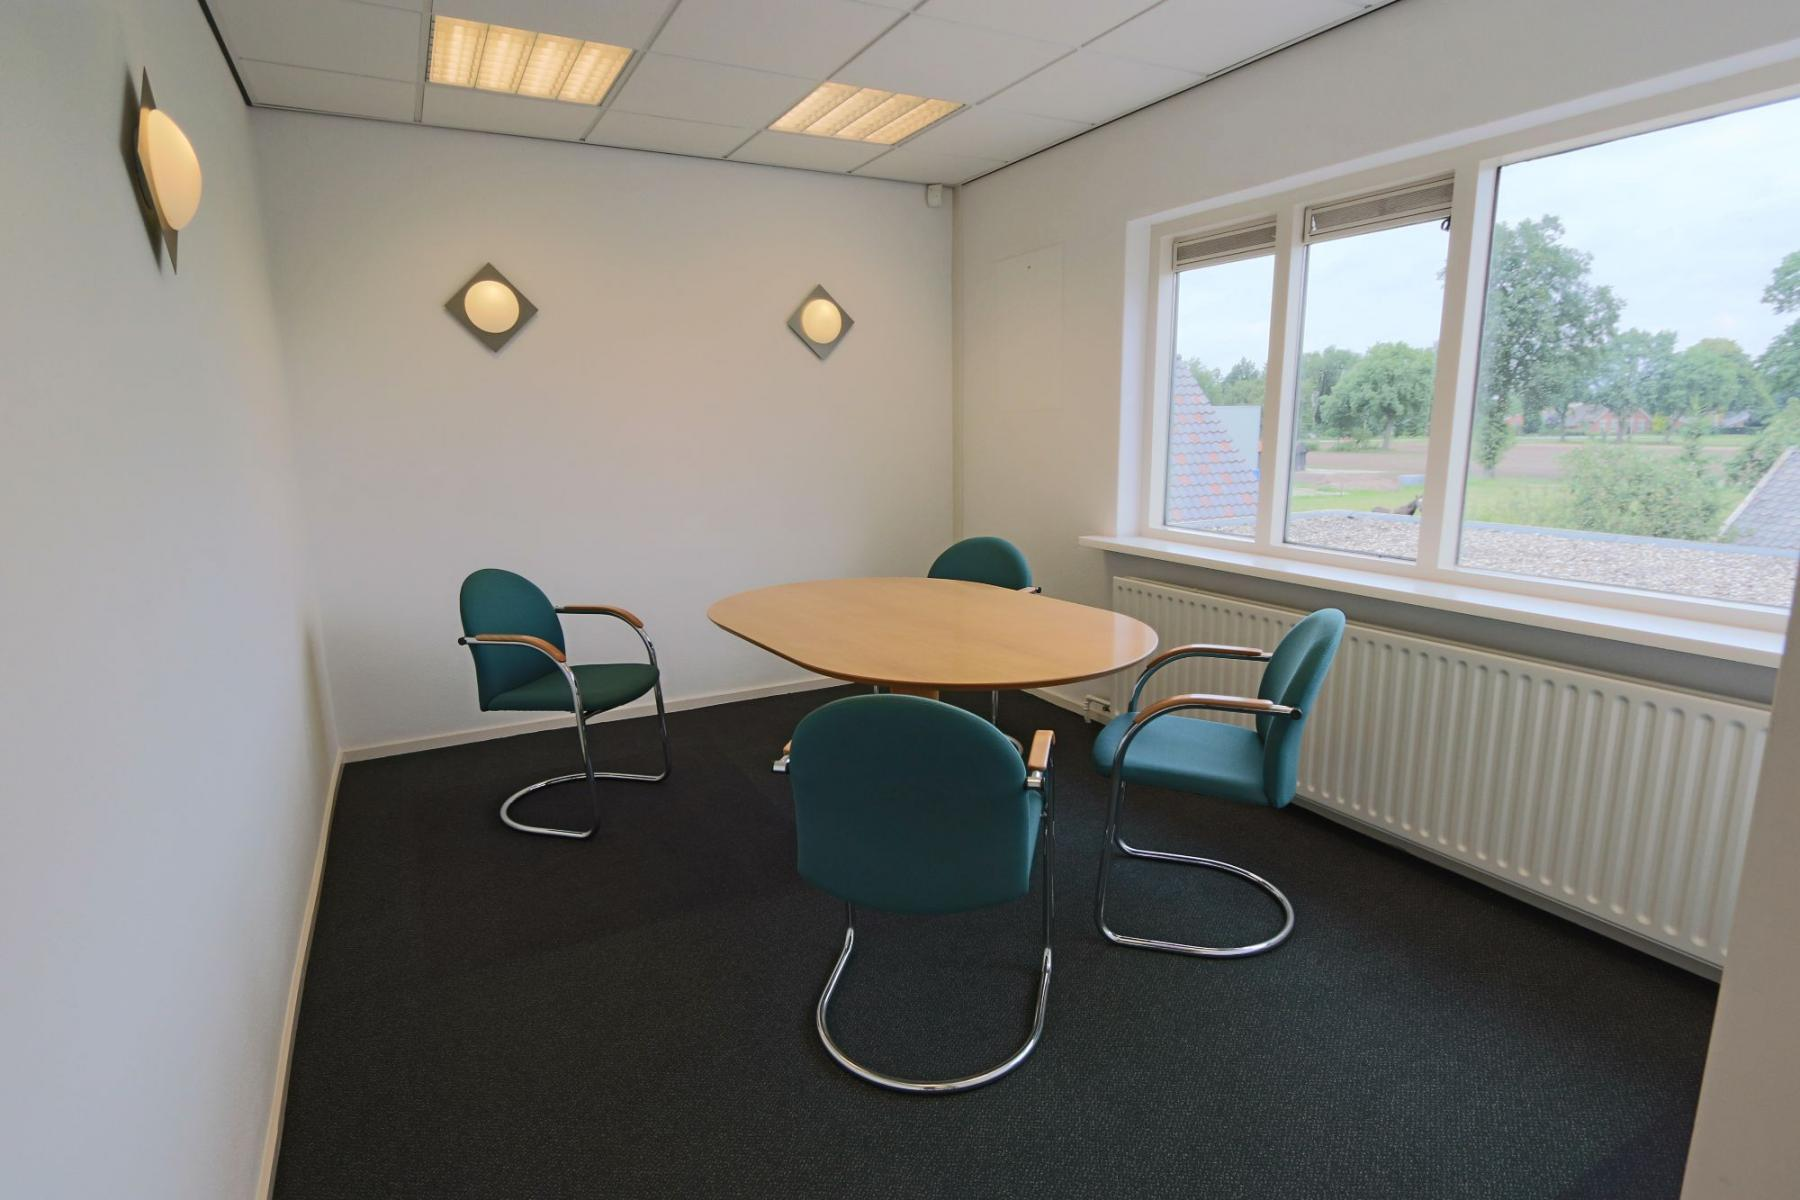 vergaderruimte presentatie kantoorkamer Hengevelde SKEPP